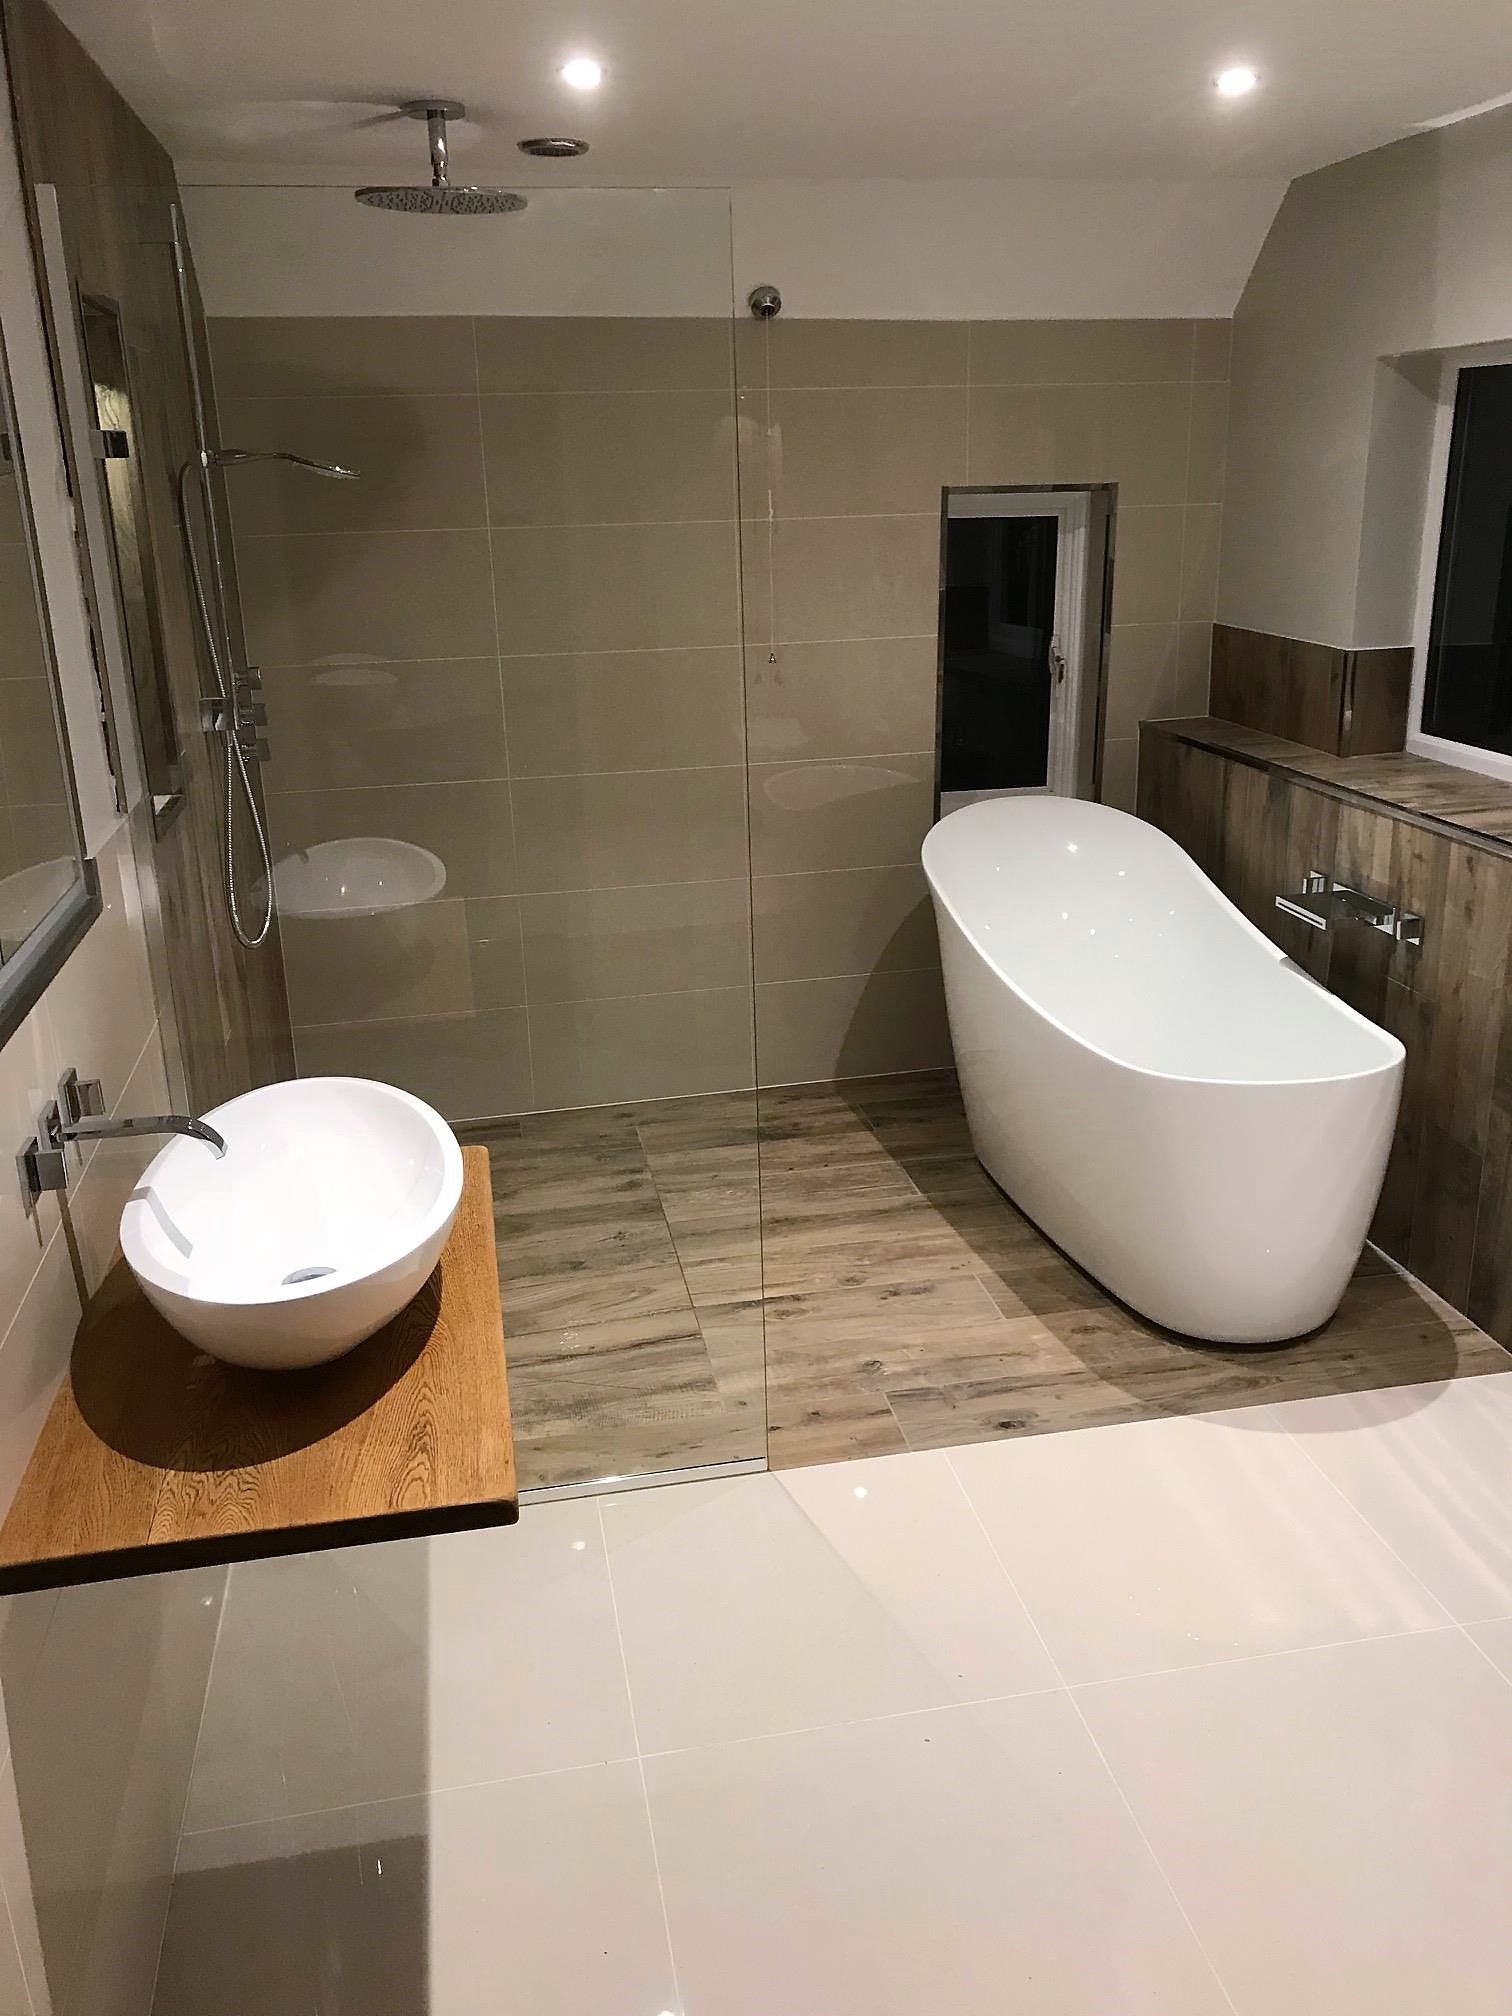 Bathrooms (5)